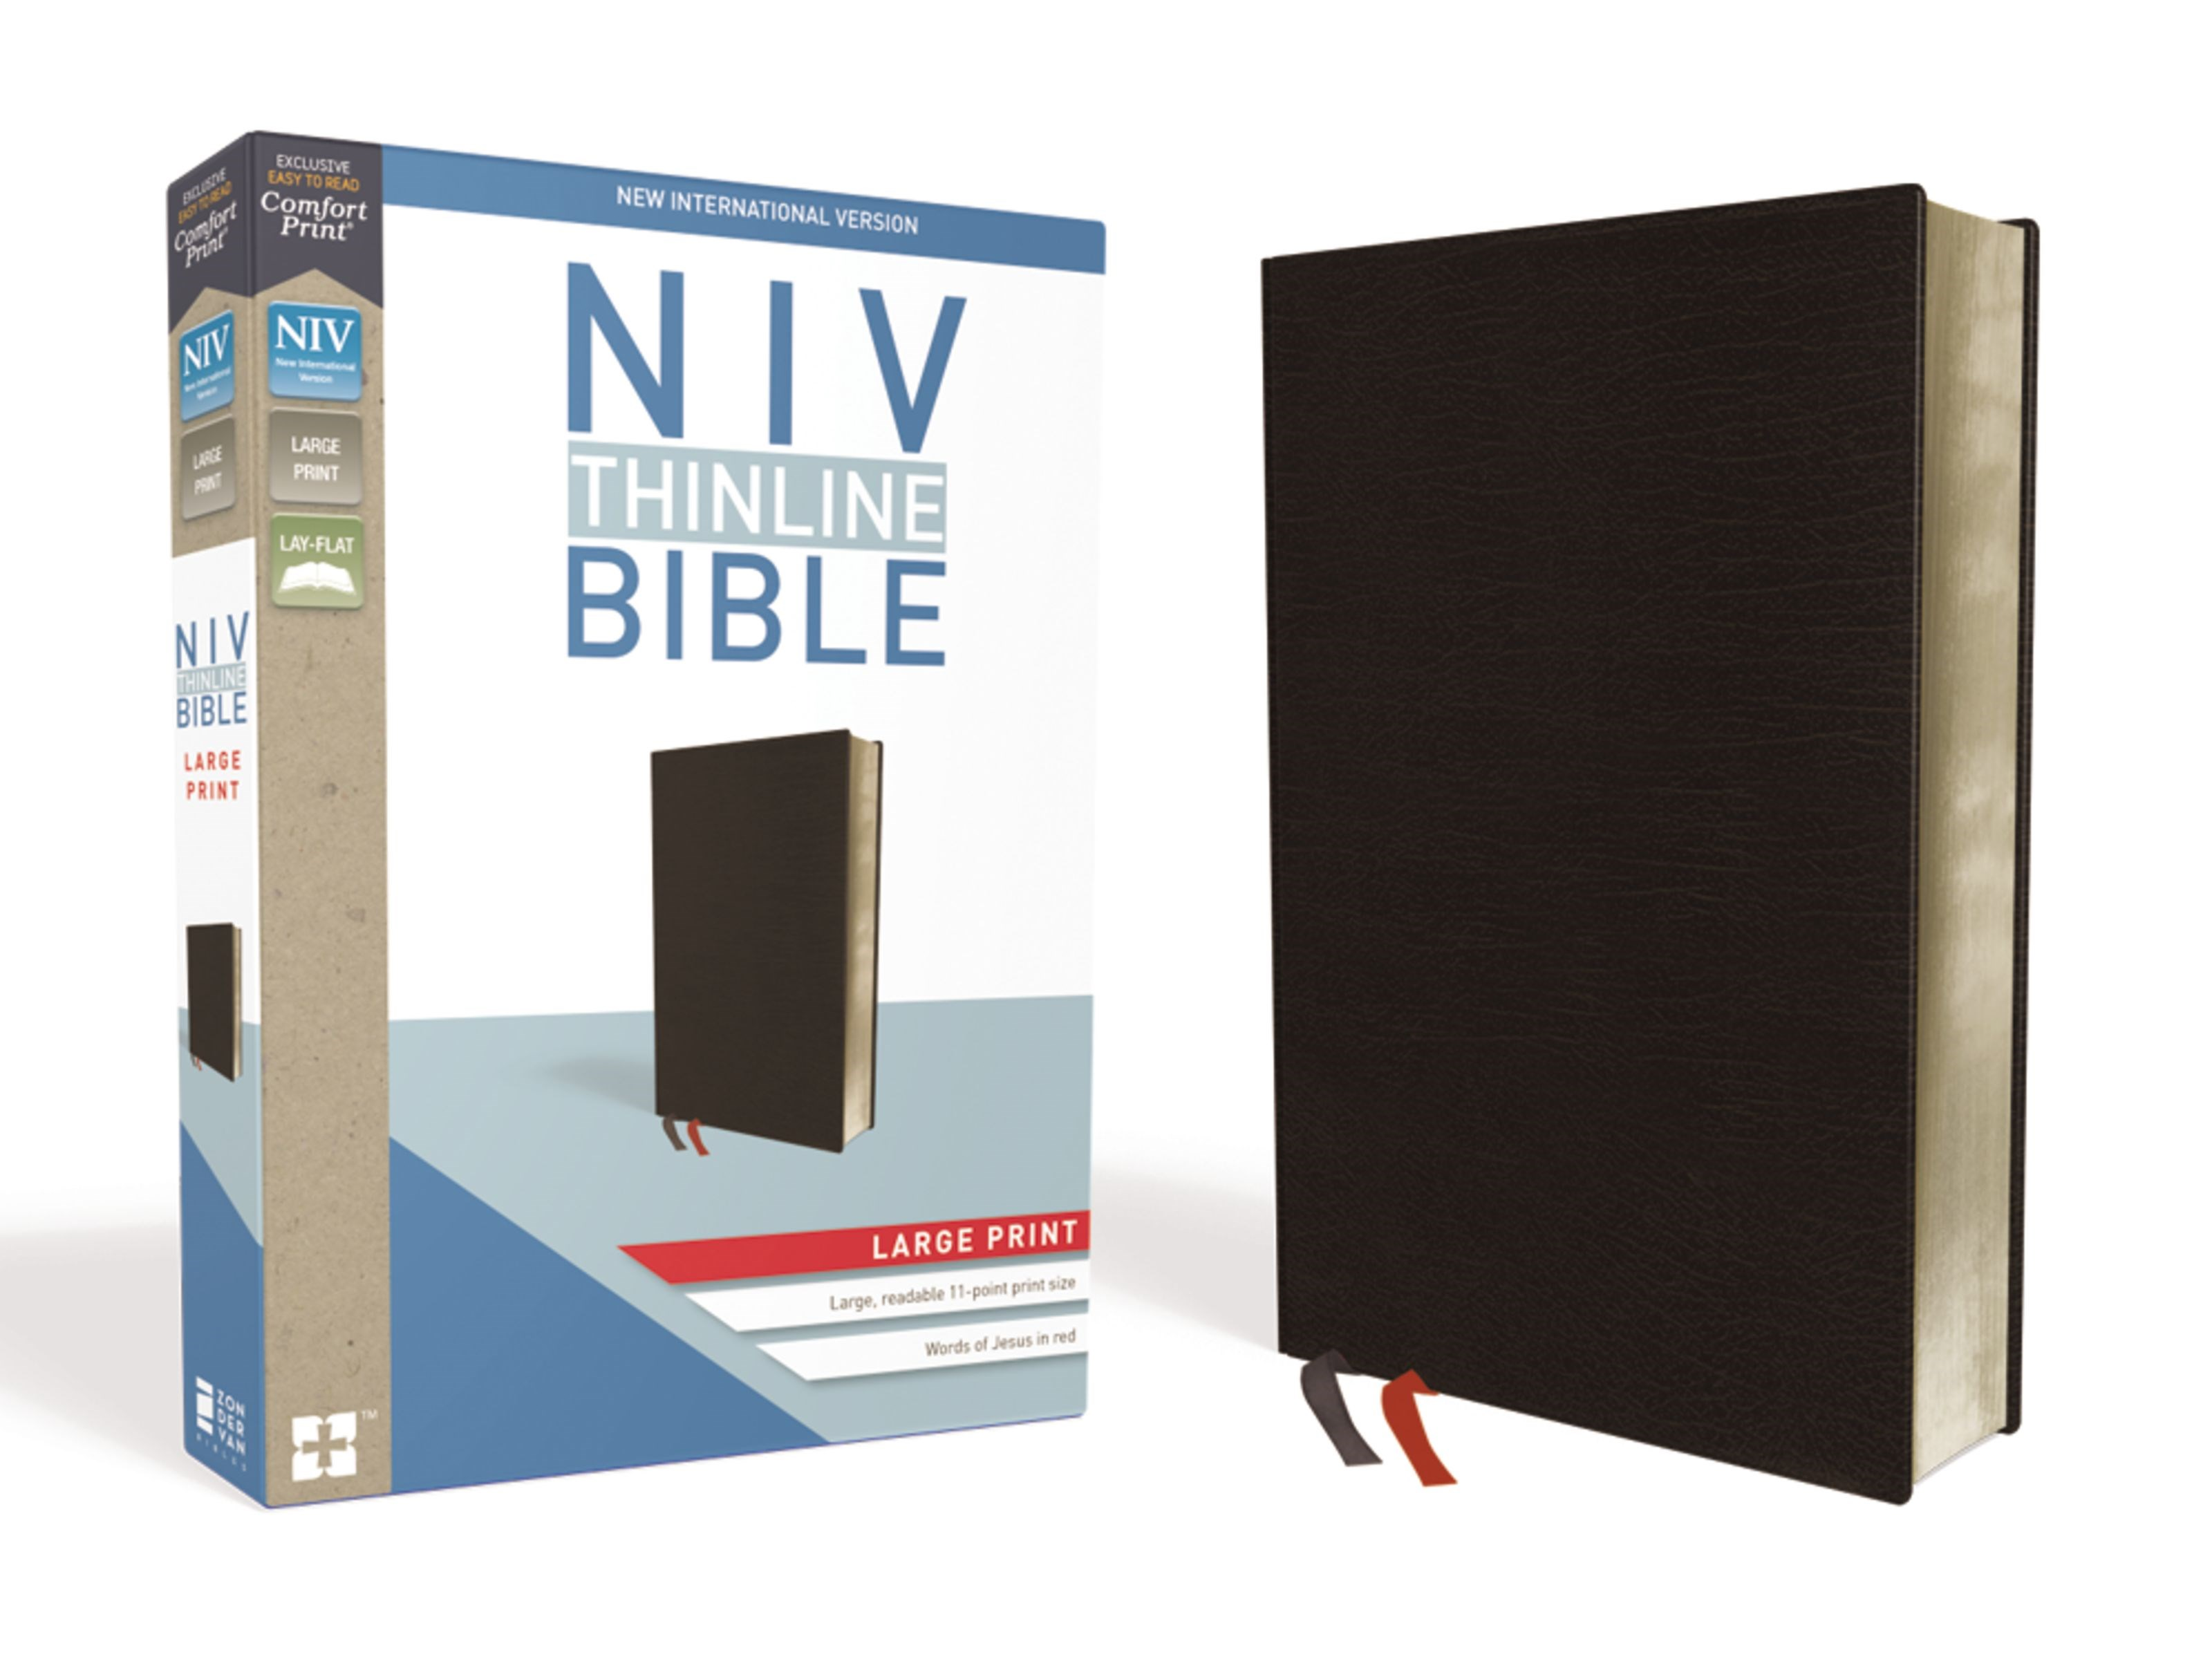 NIV Thinline Bible/Large Print (Comfort Print)-Black Bonded Leather